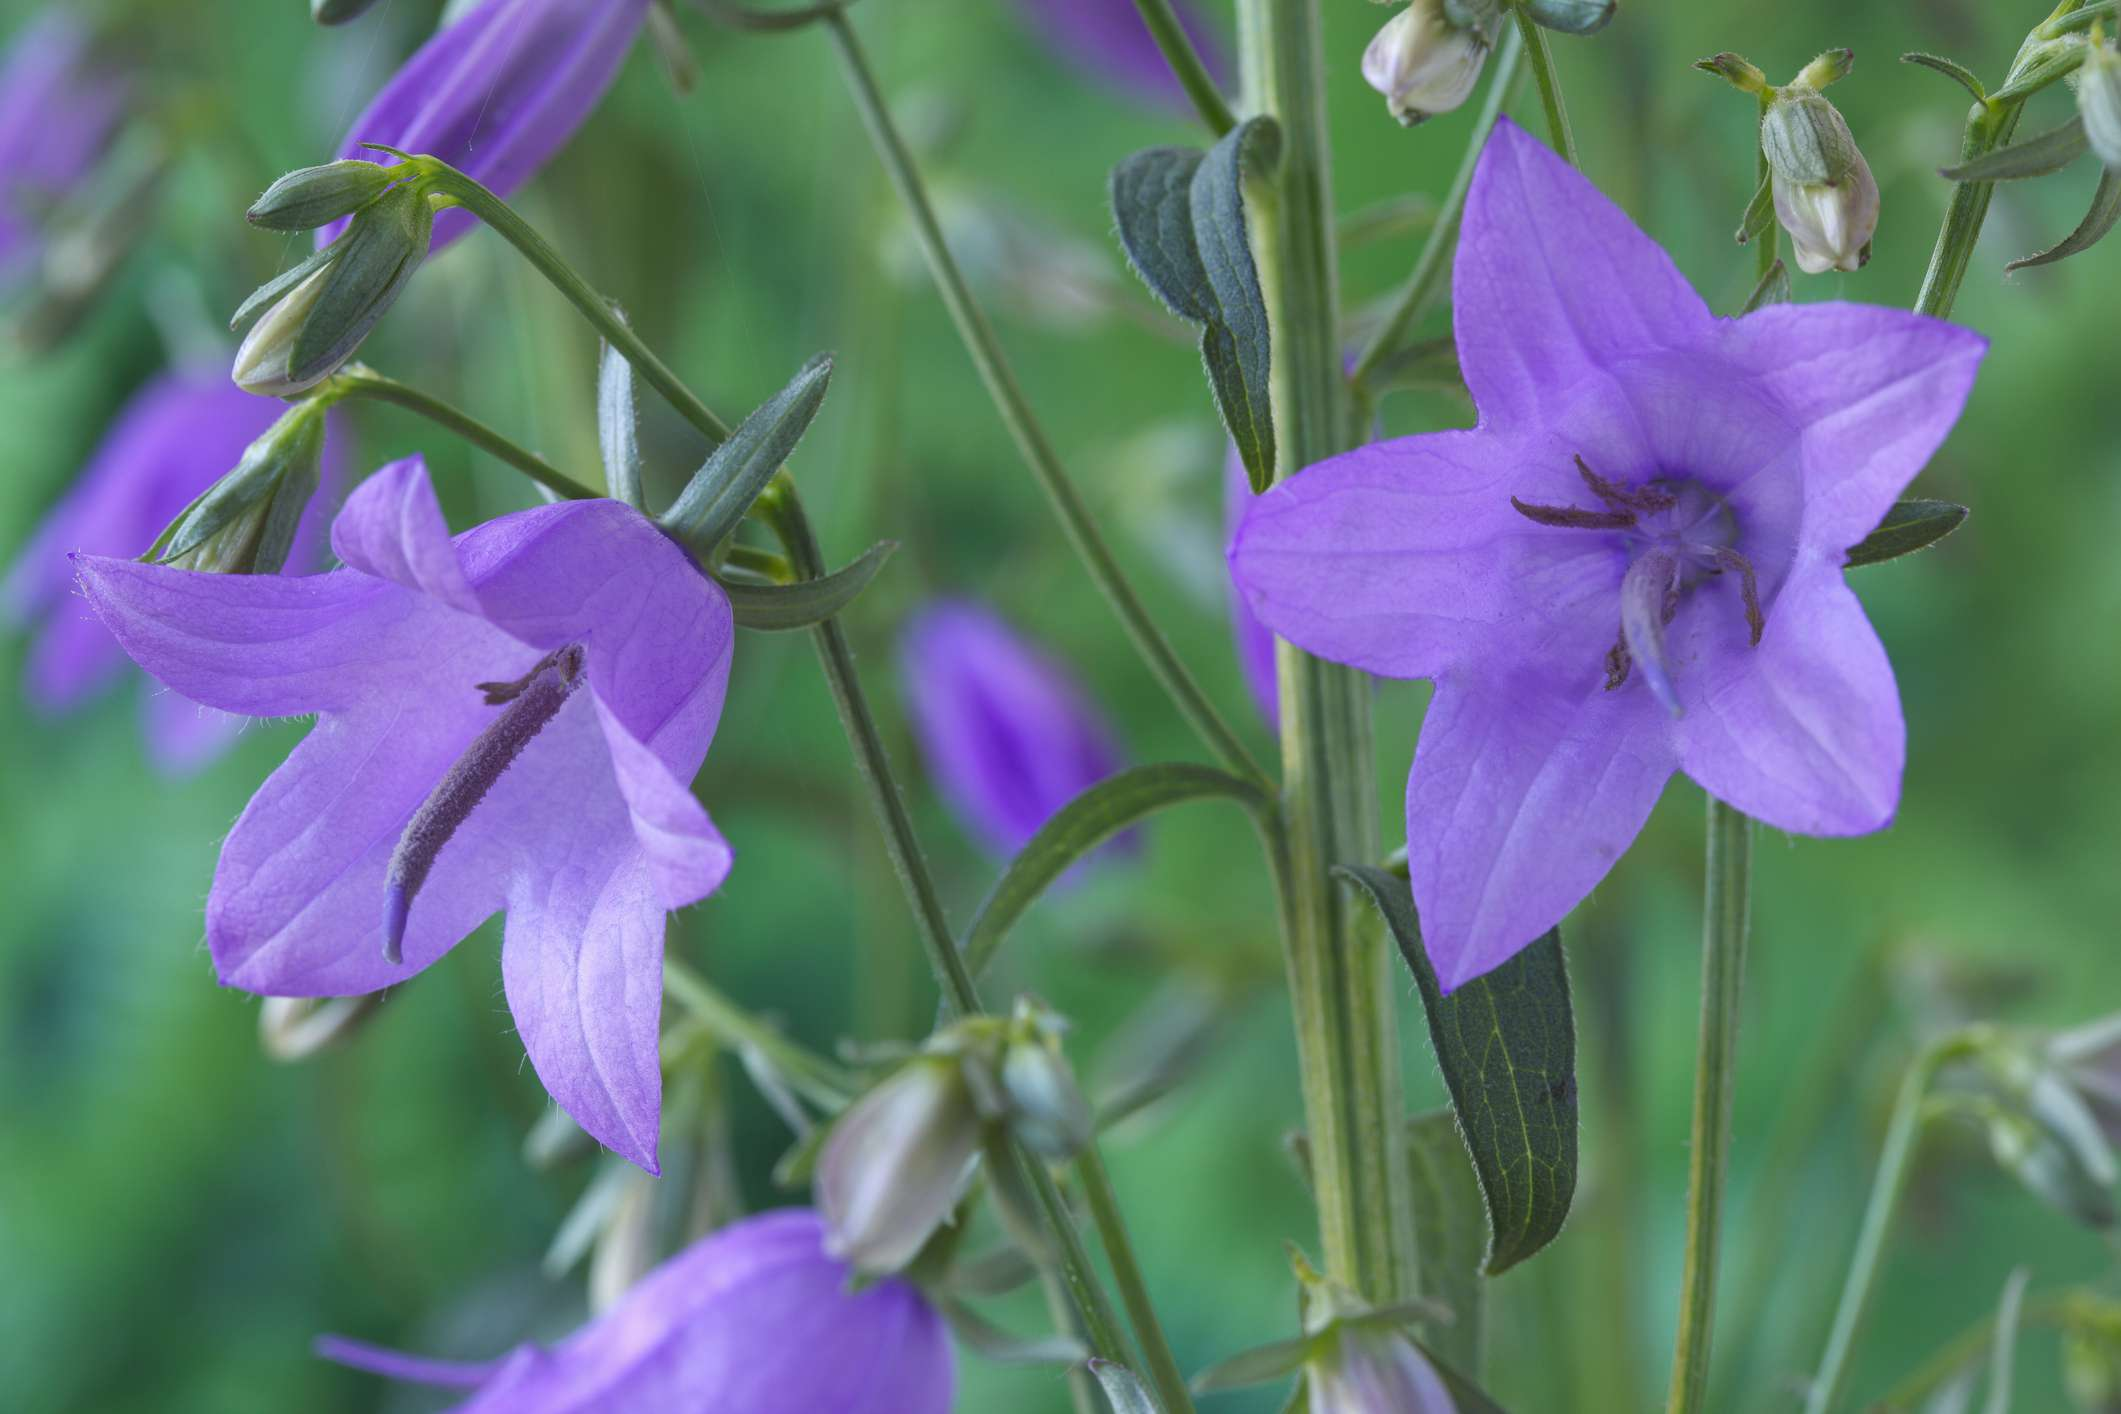 Ladybell flowers